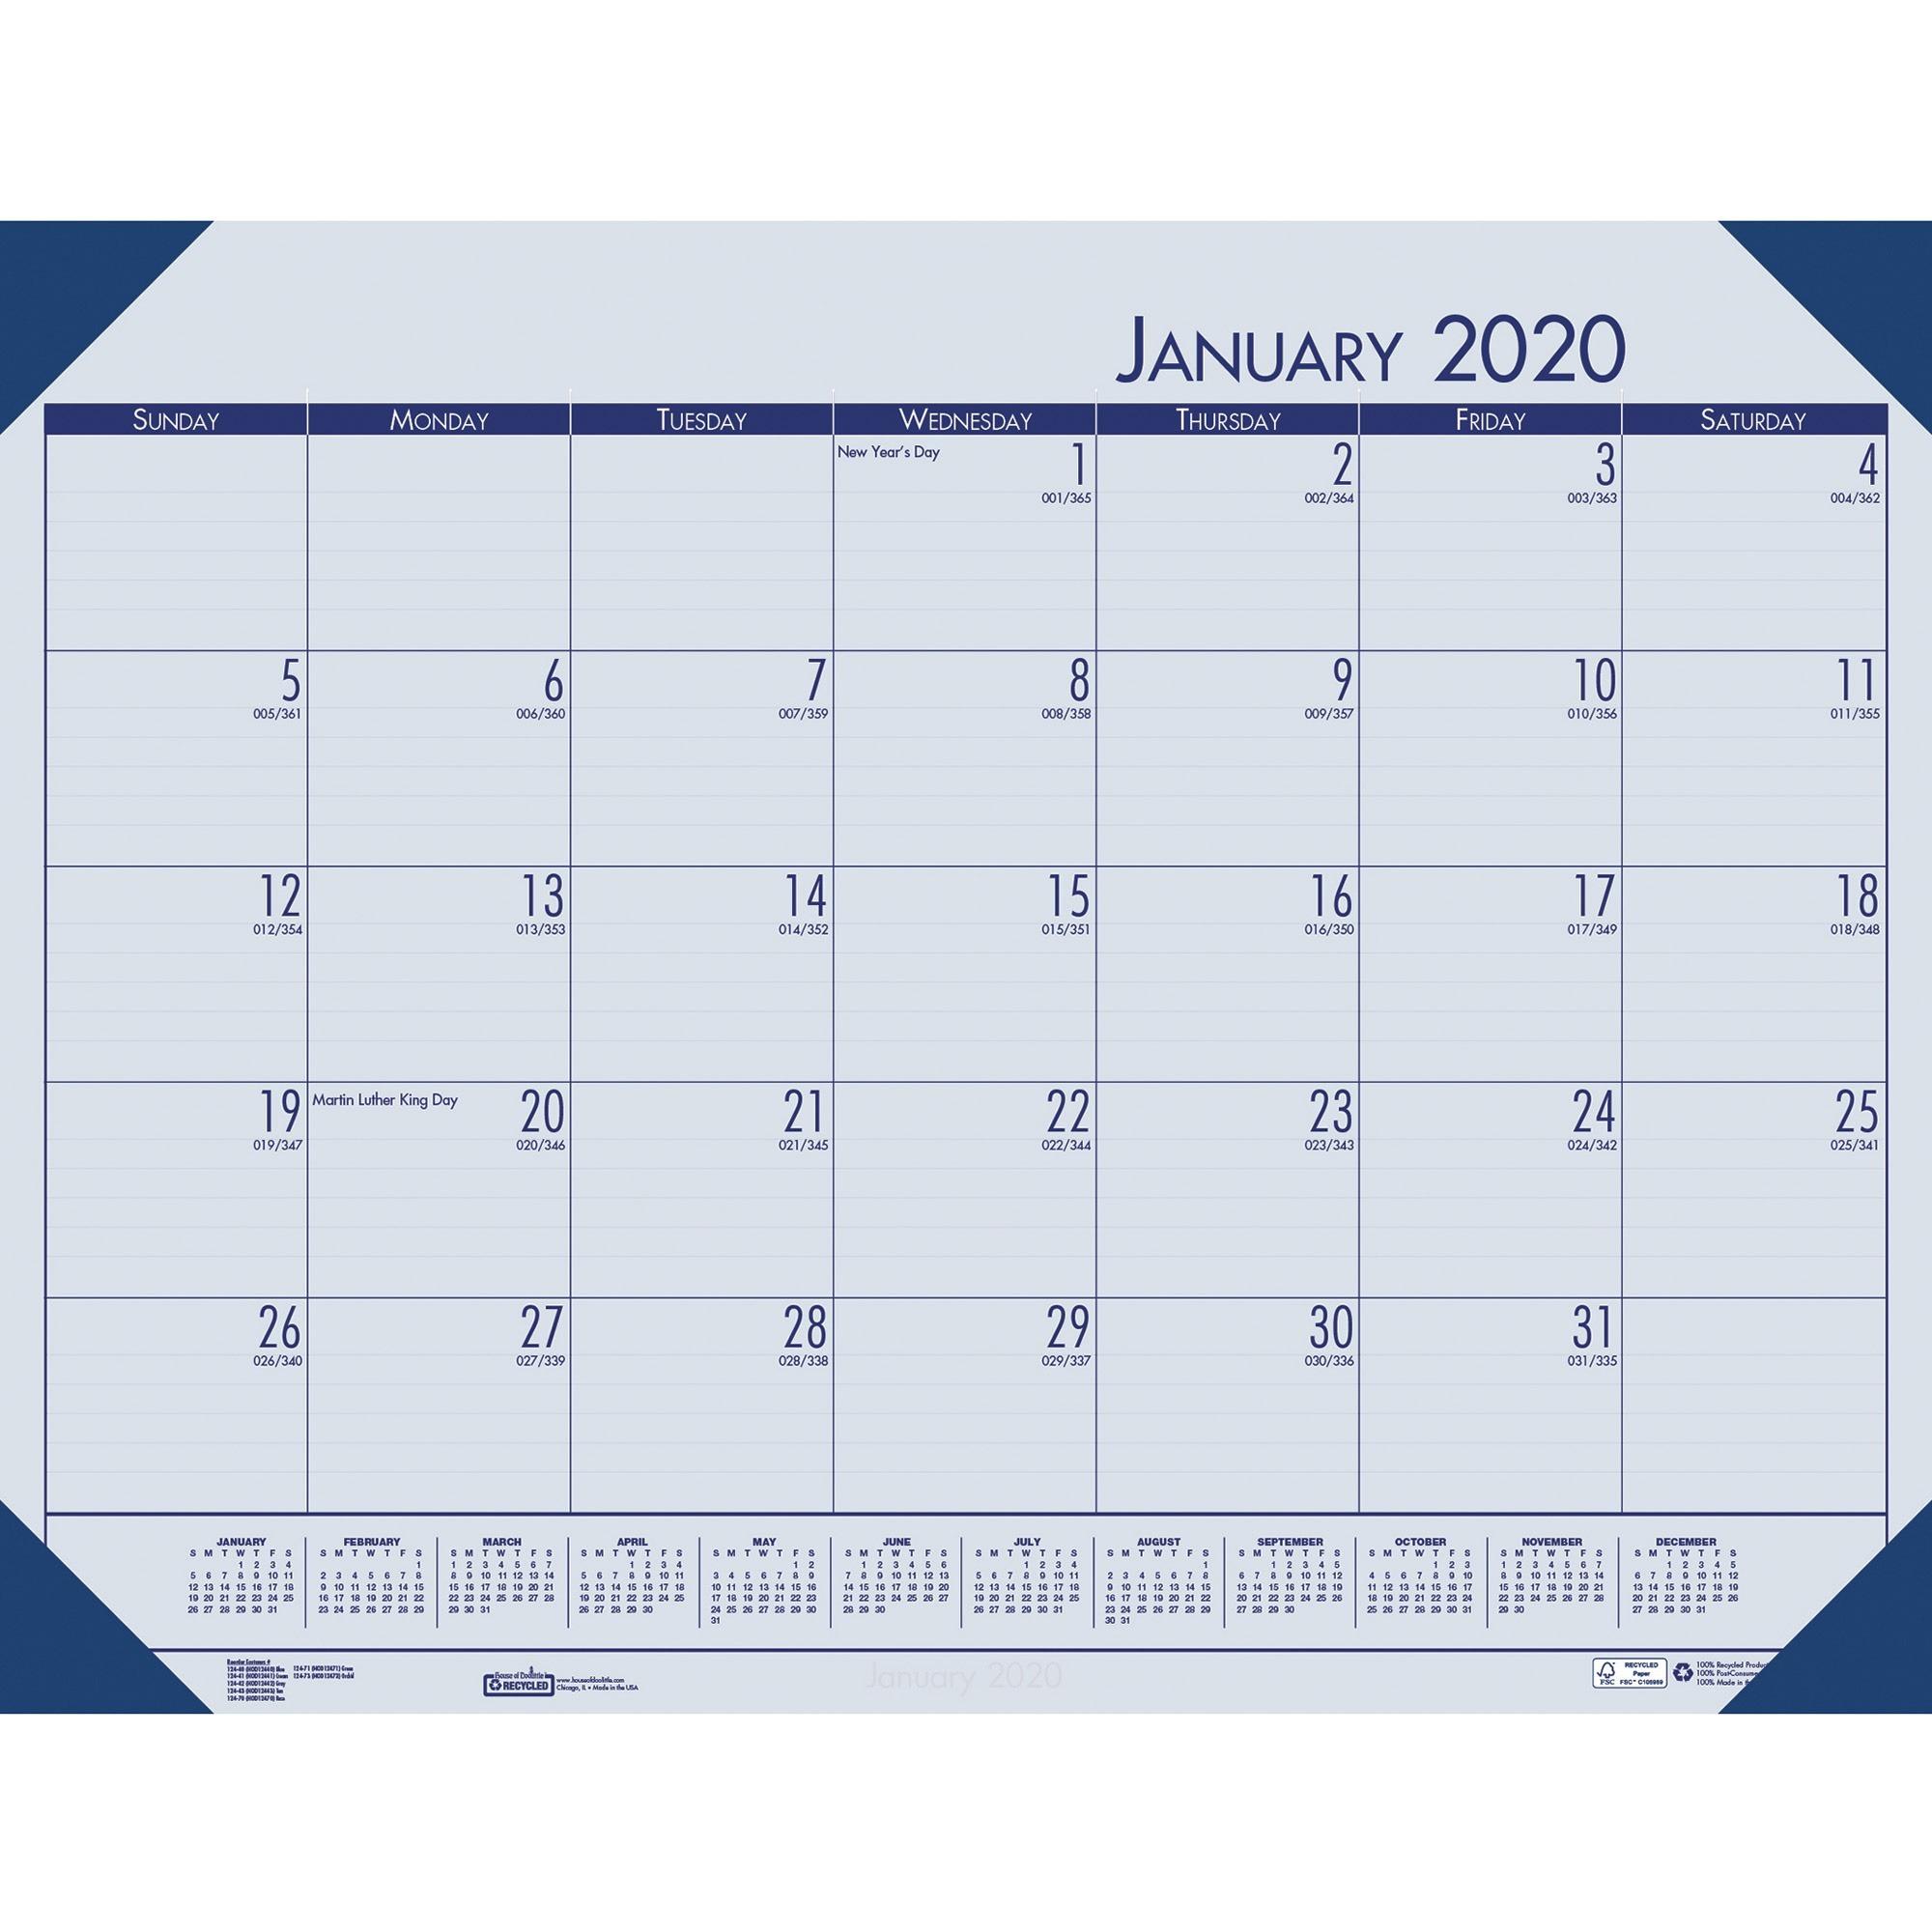 House Of Doolittle Ecotones Compact Calendar Desk Pads throughout 2021 Yearly Julian Calendar